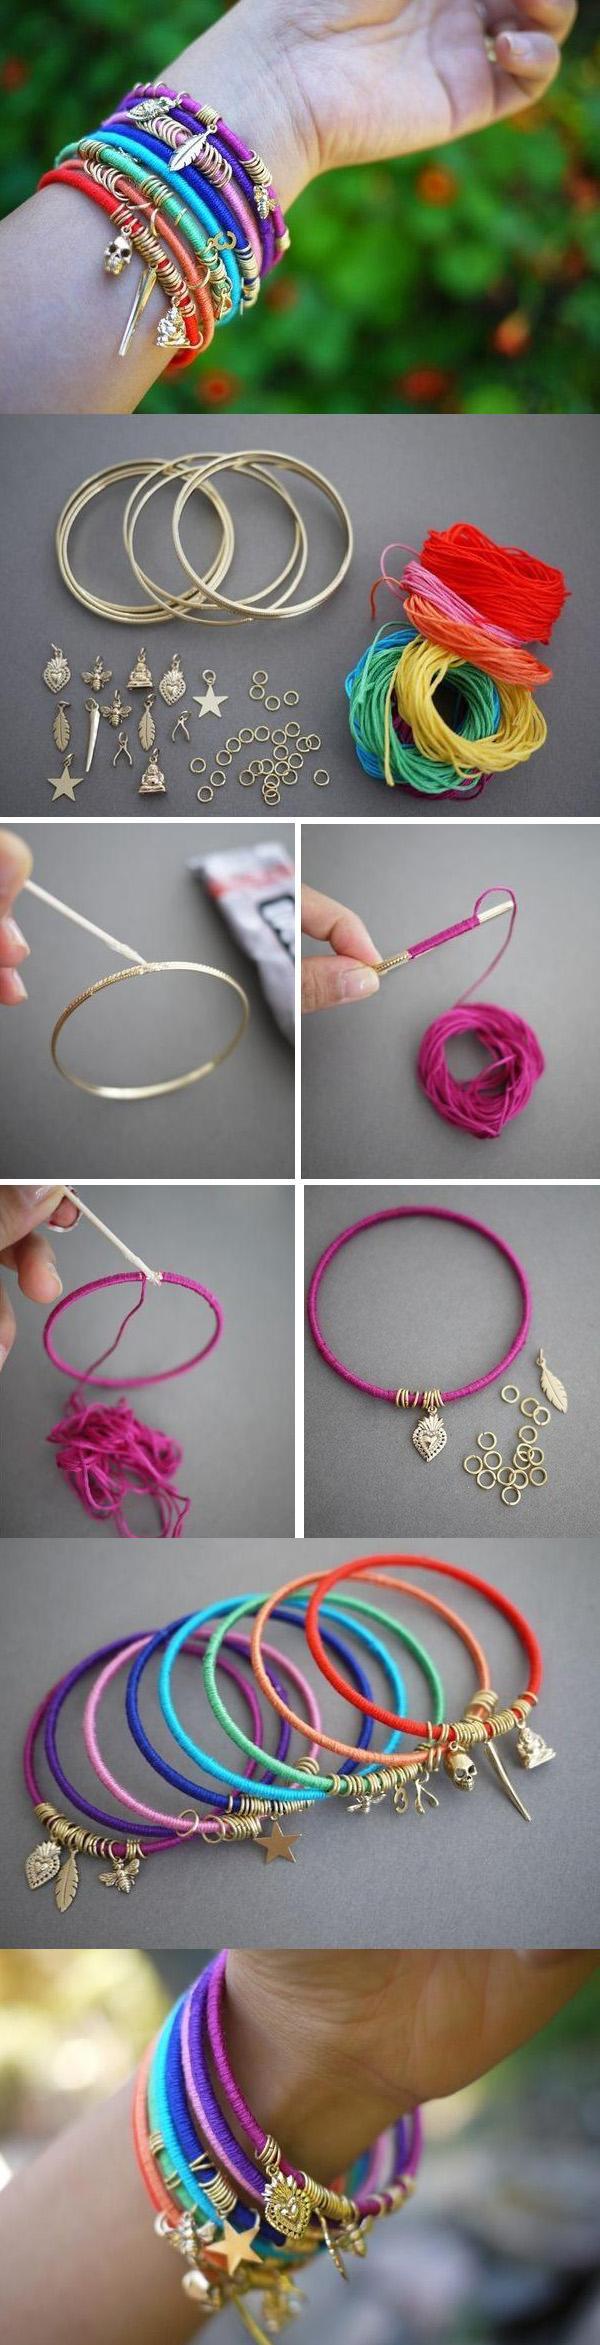 Easy DIY Bracelet-2